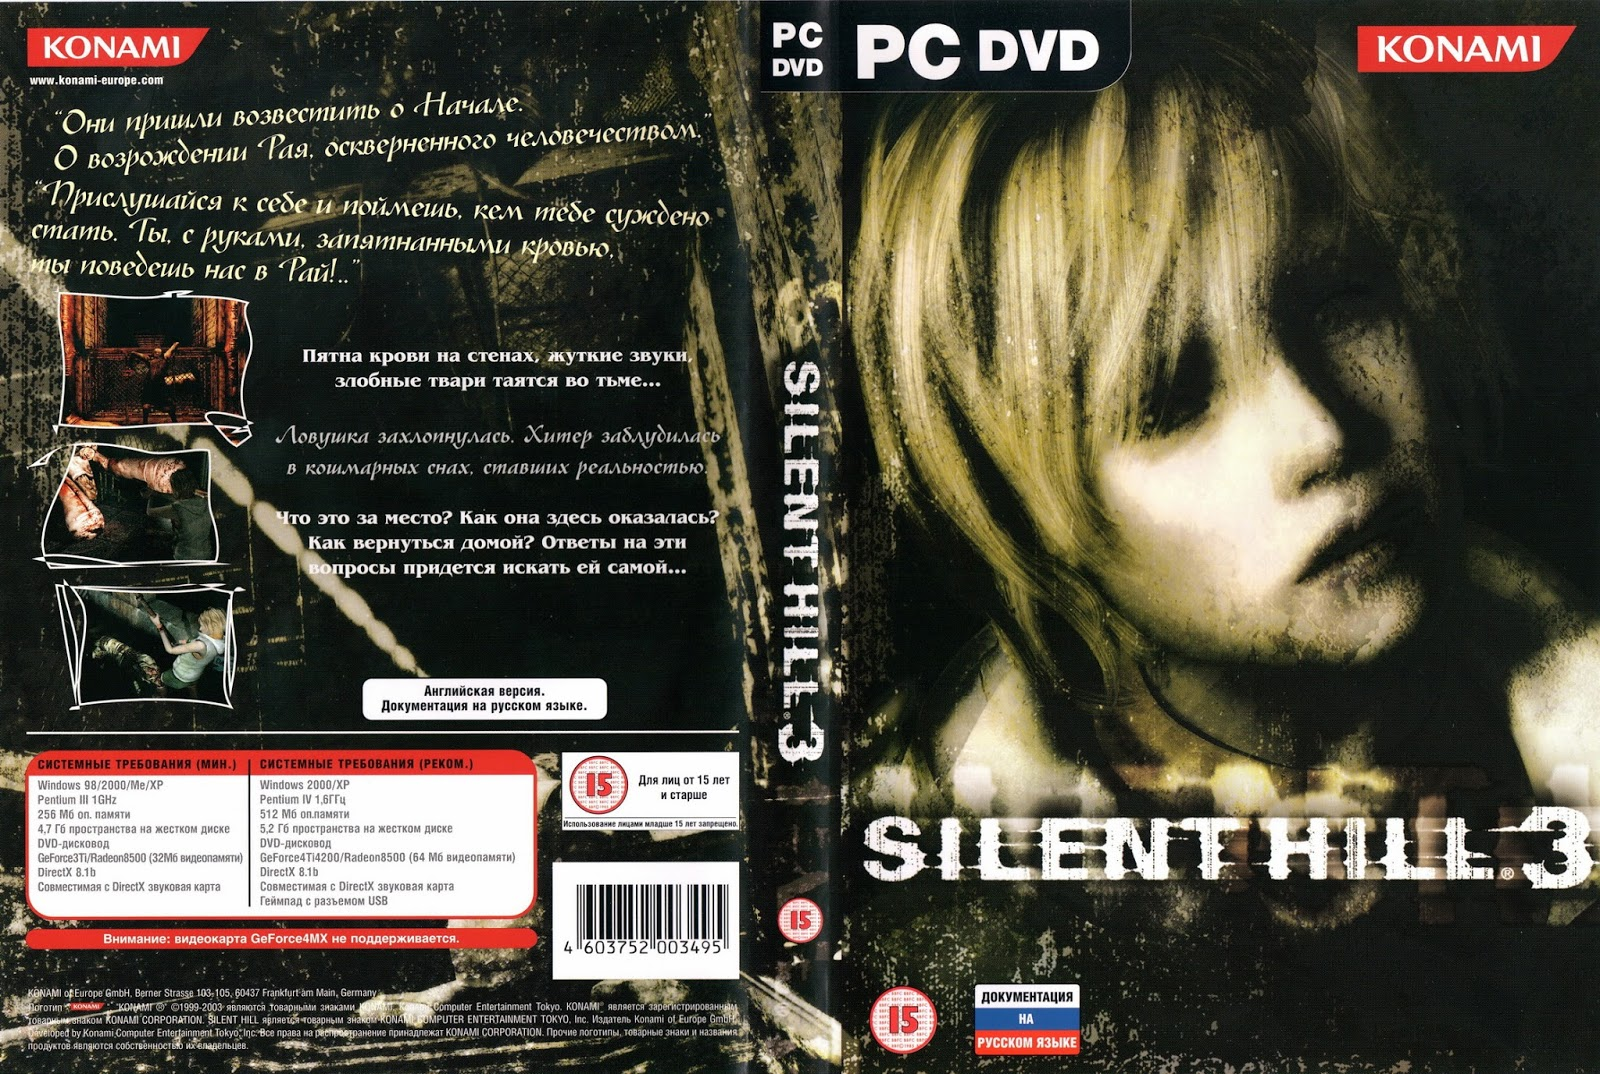 Silent Hill 3 pc full español 1 link mega